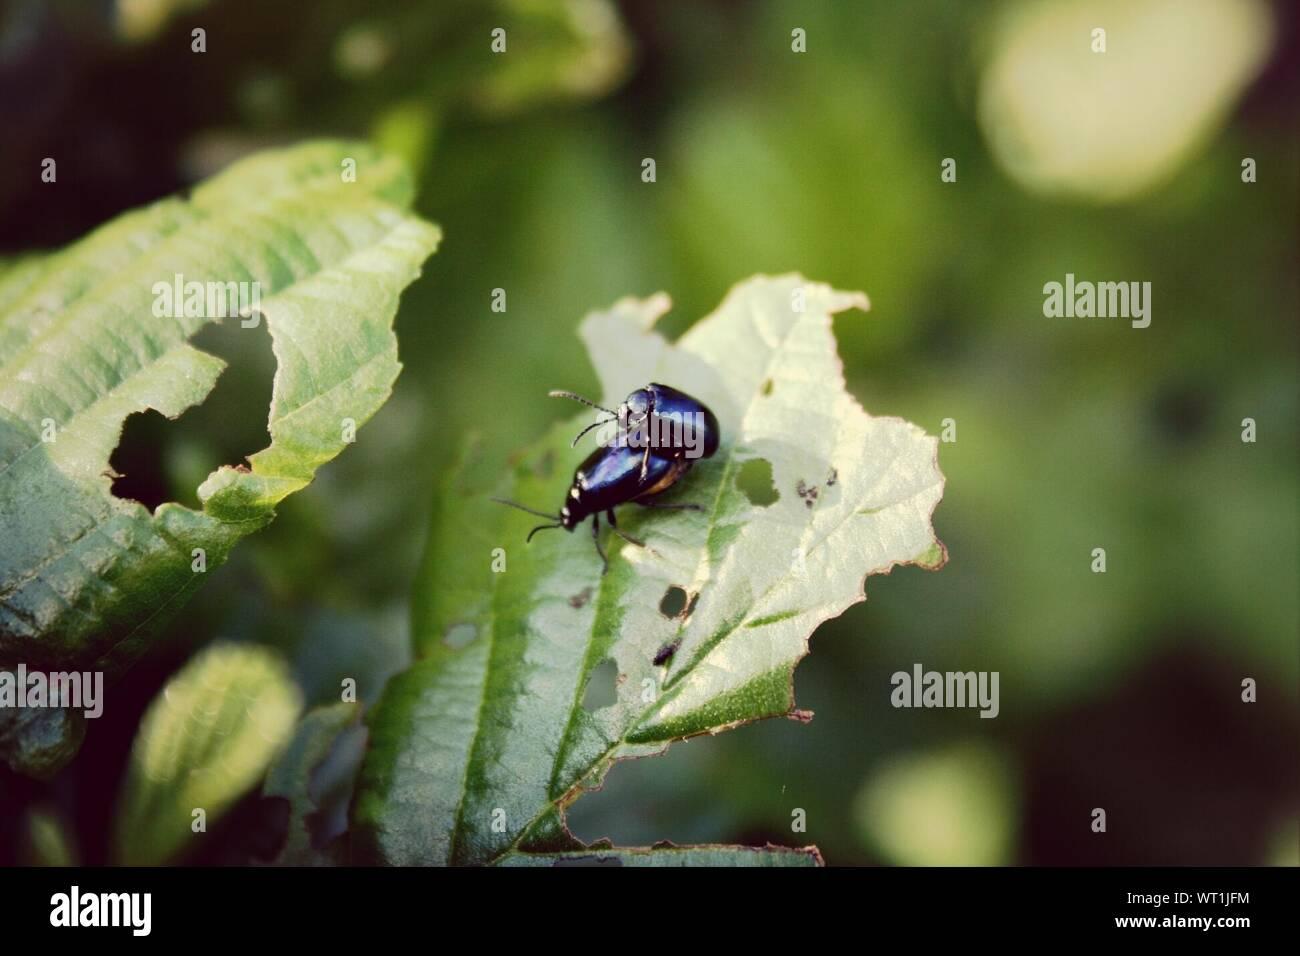 Passende Paar schwarze Käfer Stockfoto